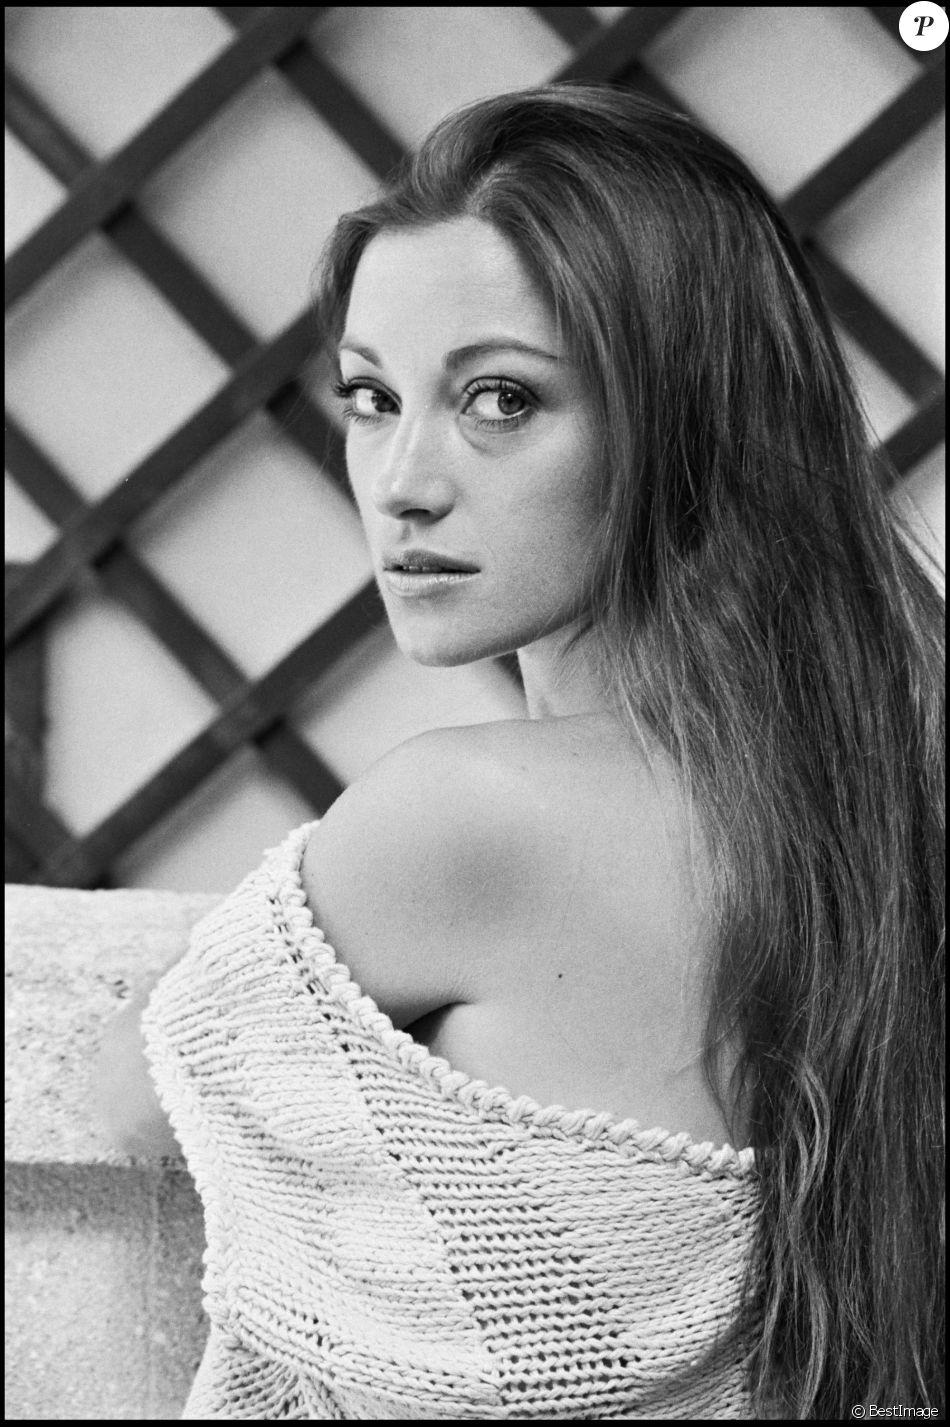 Anna Fegi (b. 1977),Winston Rekert Sex clip Saundra Edwards,Samantha Droke